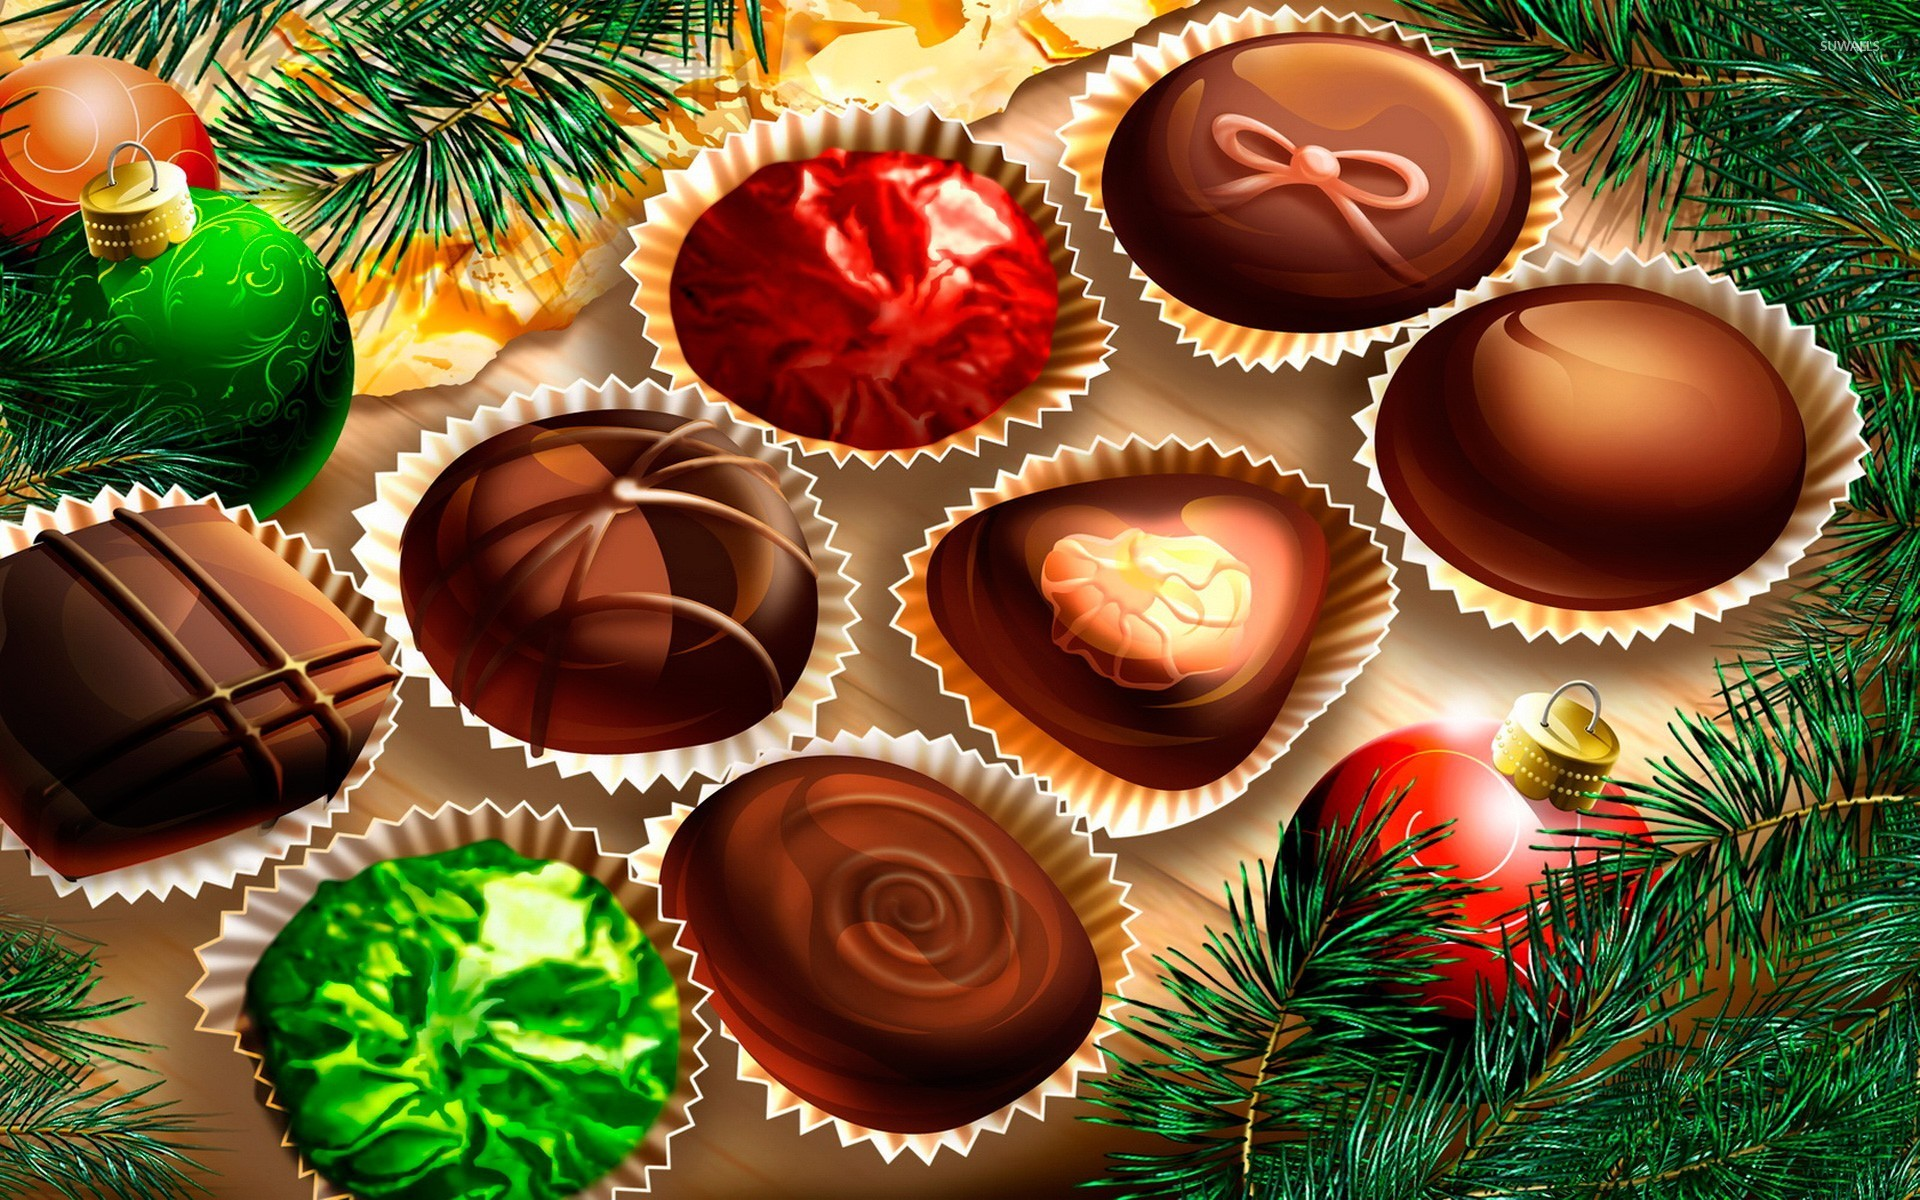 Photo Collection Christmas Wallpaper 2012 Chocolates